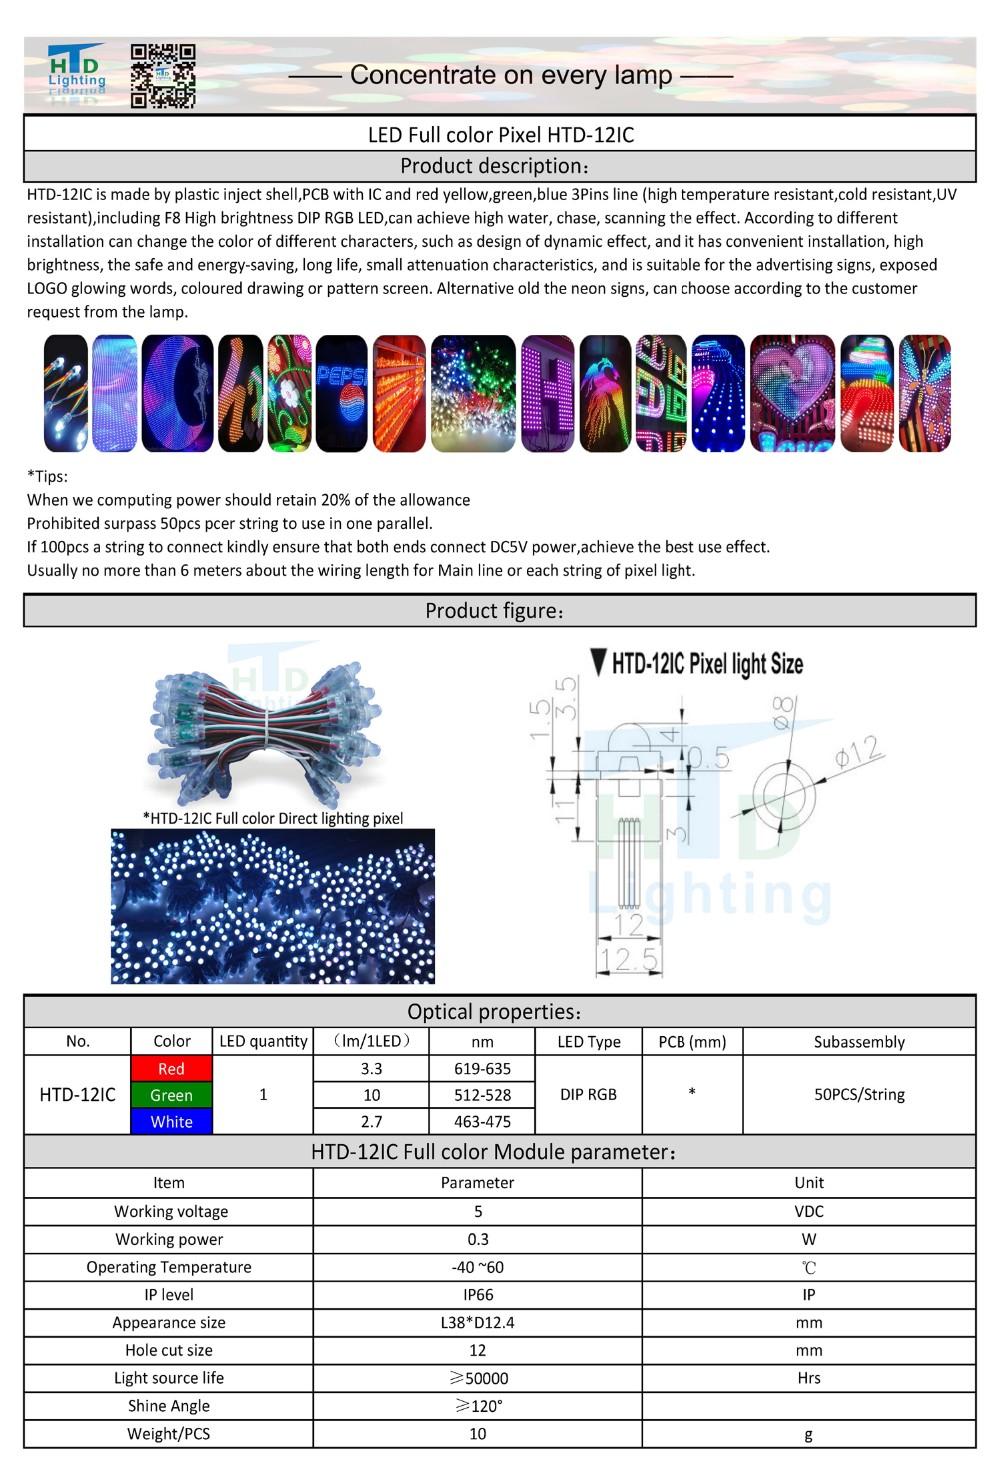 HTD-12IC LED Full color pixel-SPEC 201605__1